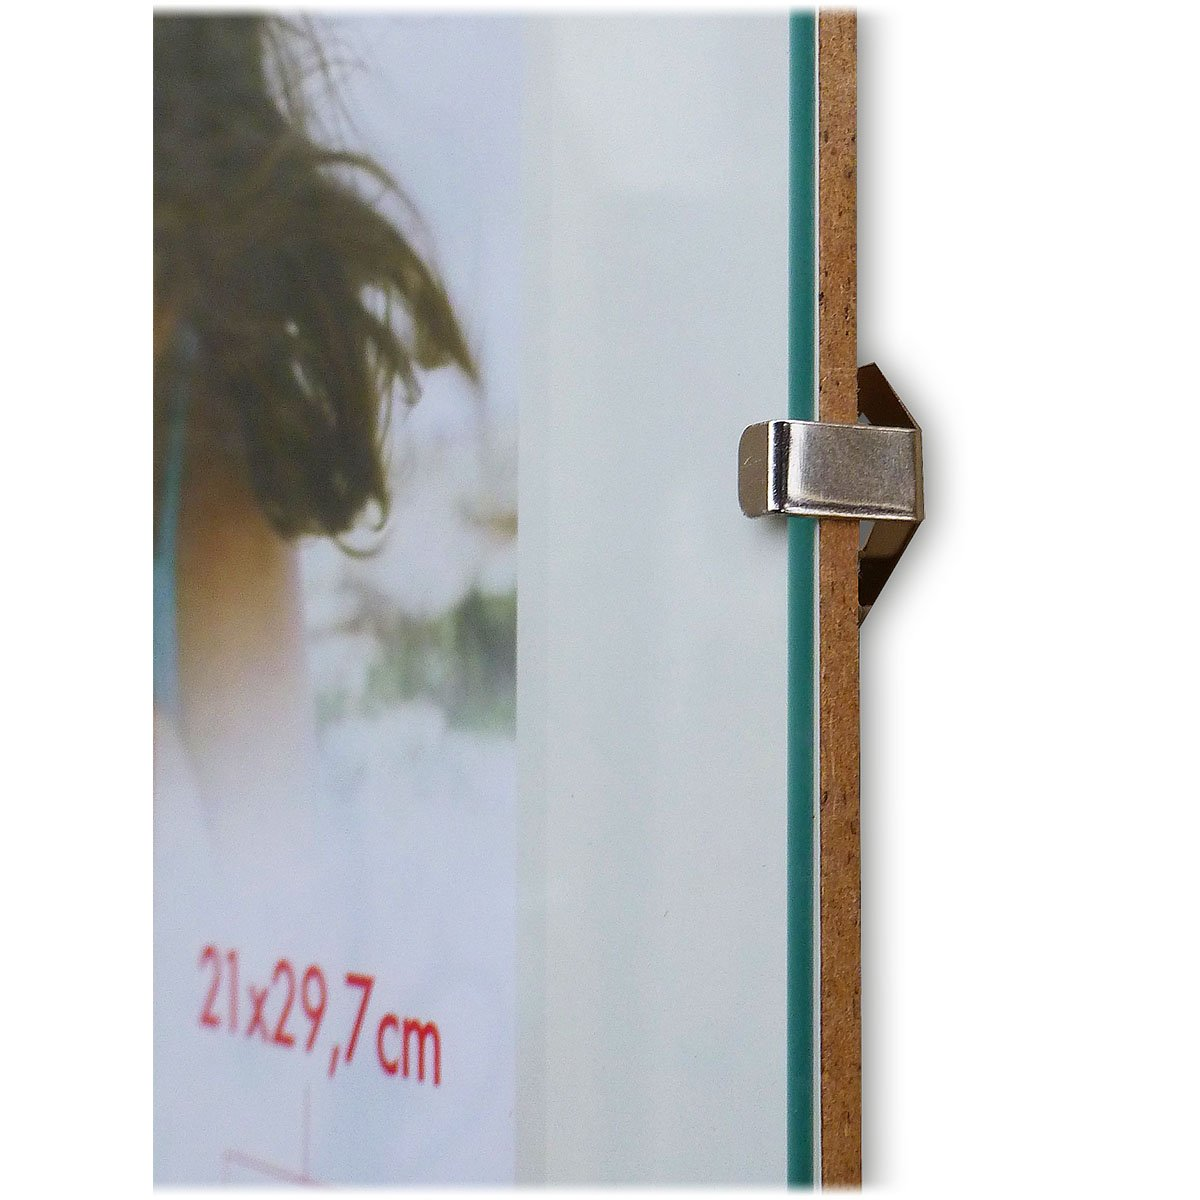 Amazon.de: Rahmenloser Bilderrahmen Bildhalter Cliprahmen 70x100cm ...